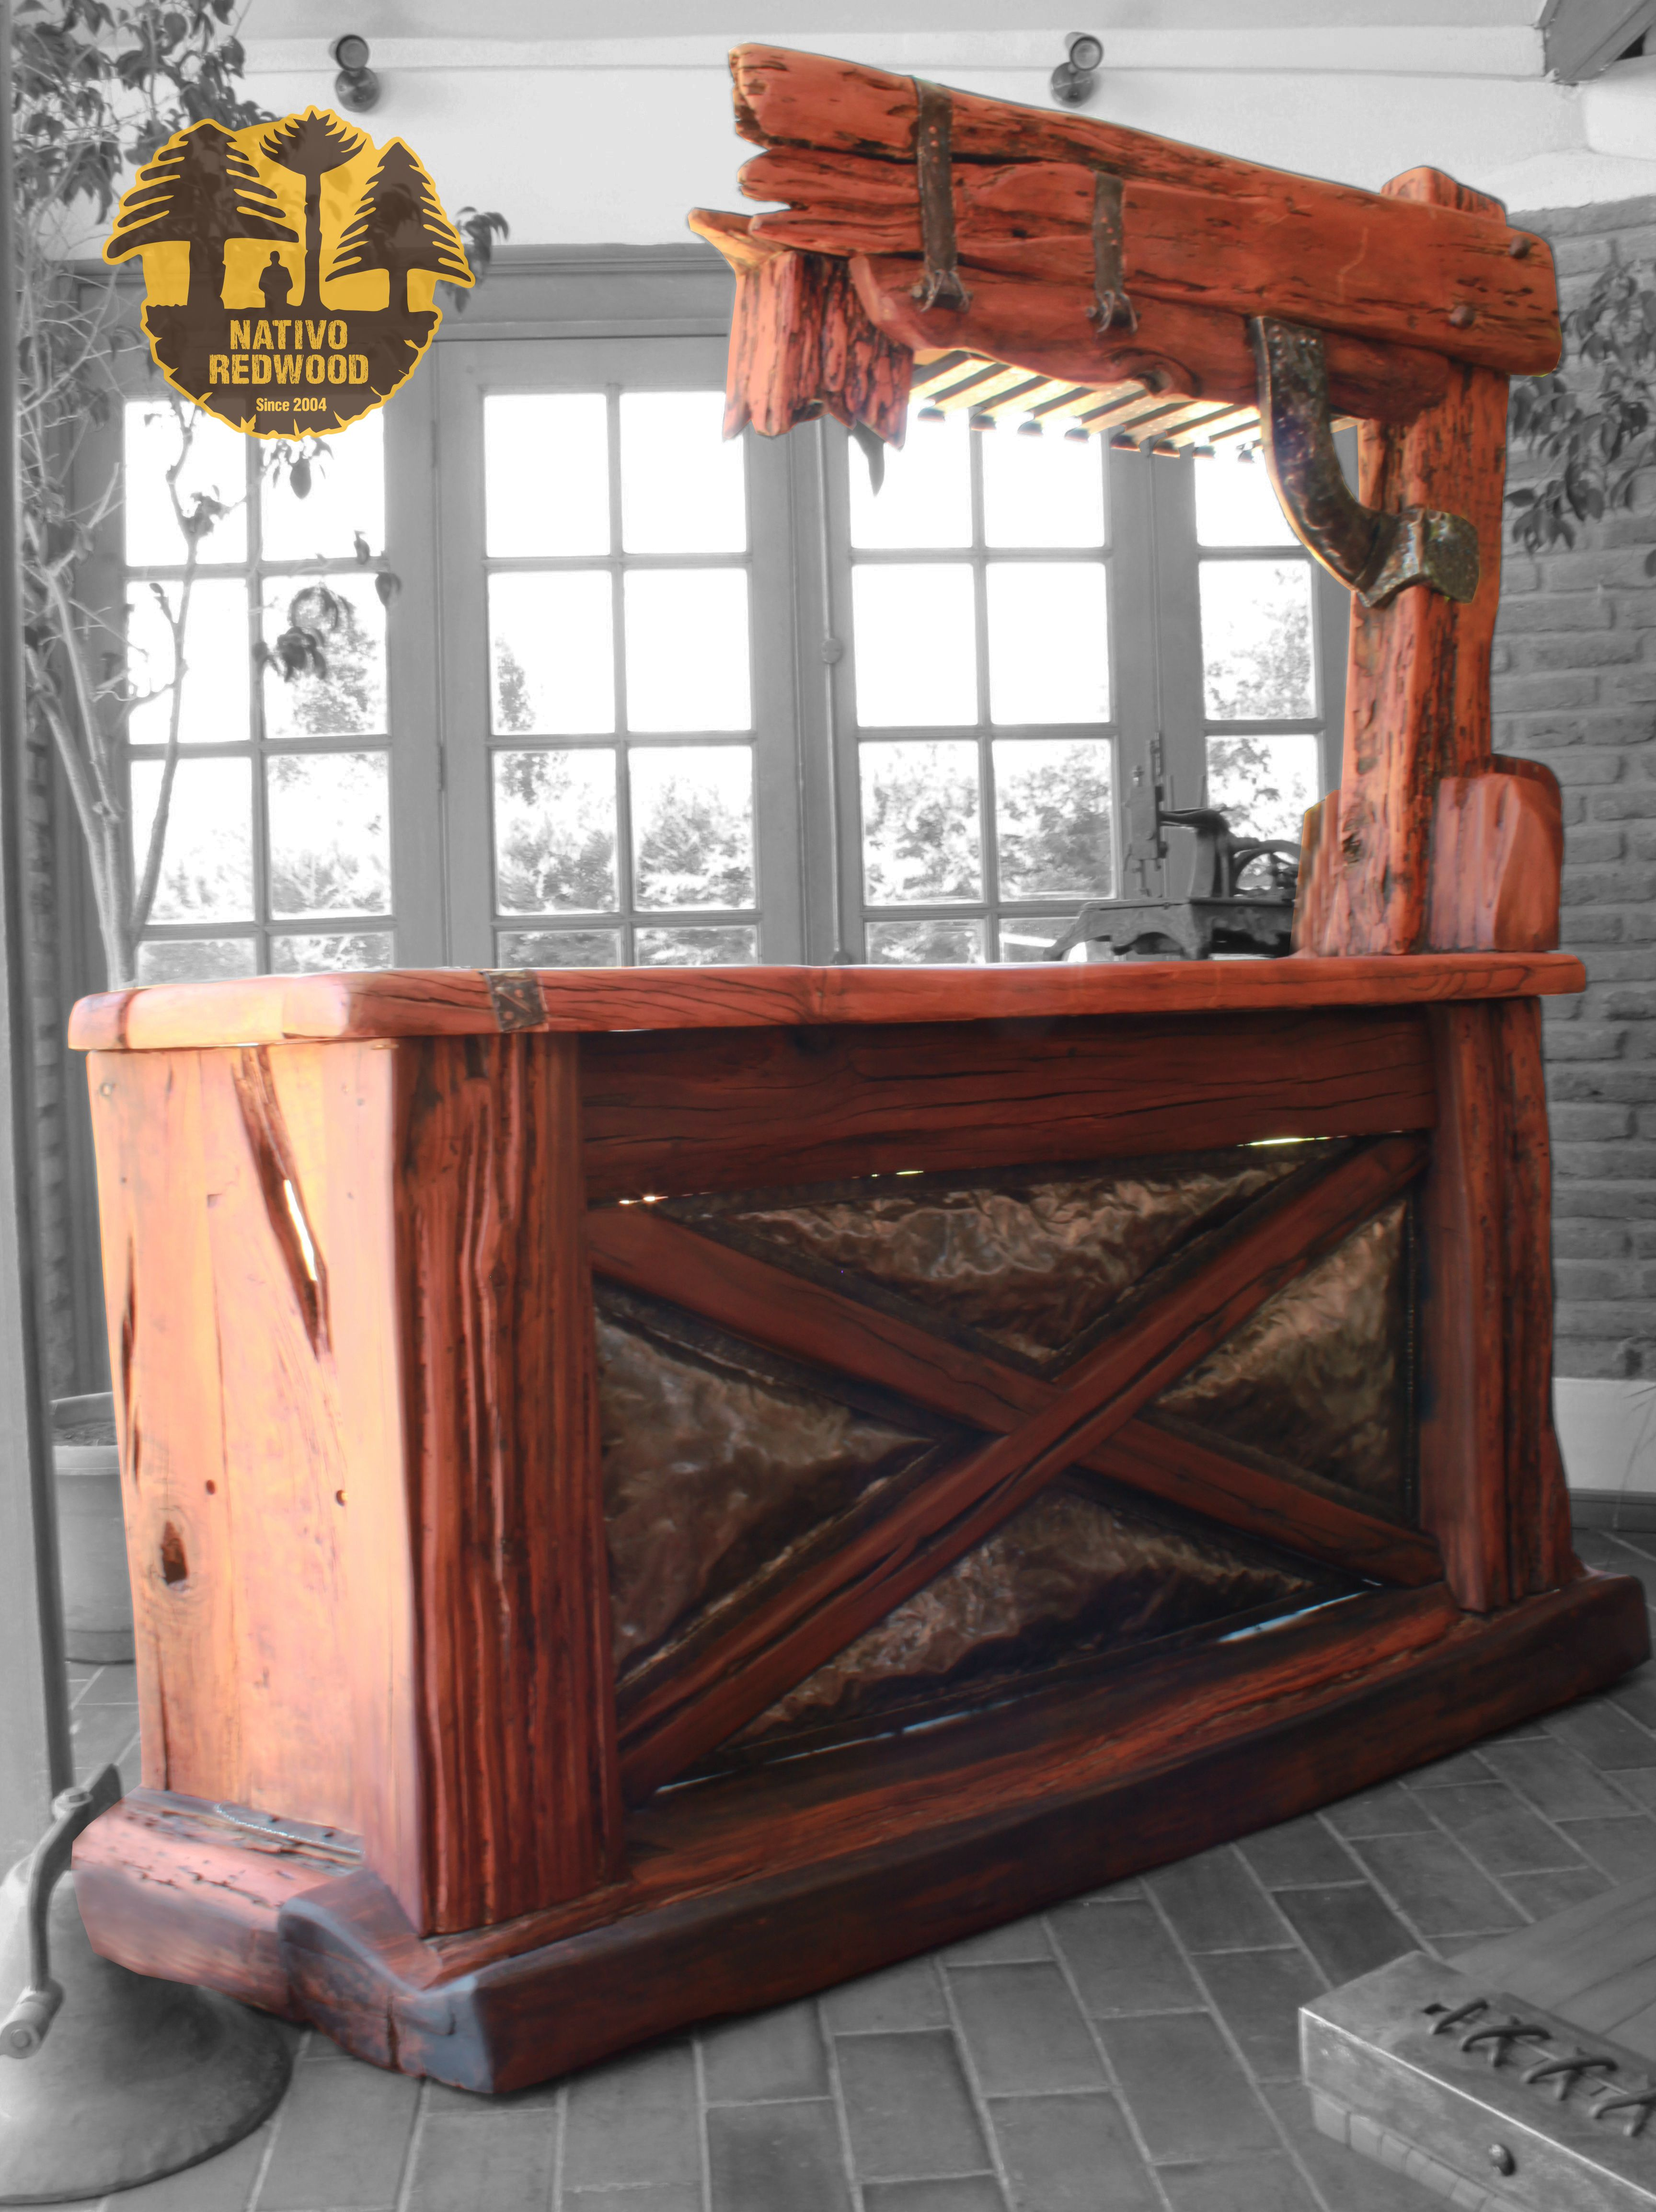 Nativo redwood bar de roble rustico mezclado con for Bar de madera chile